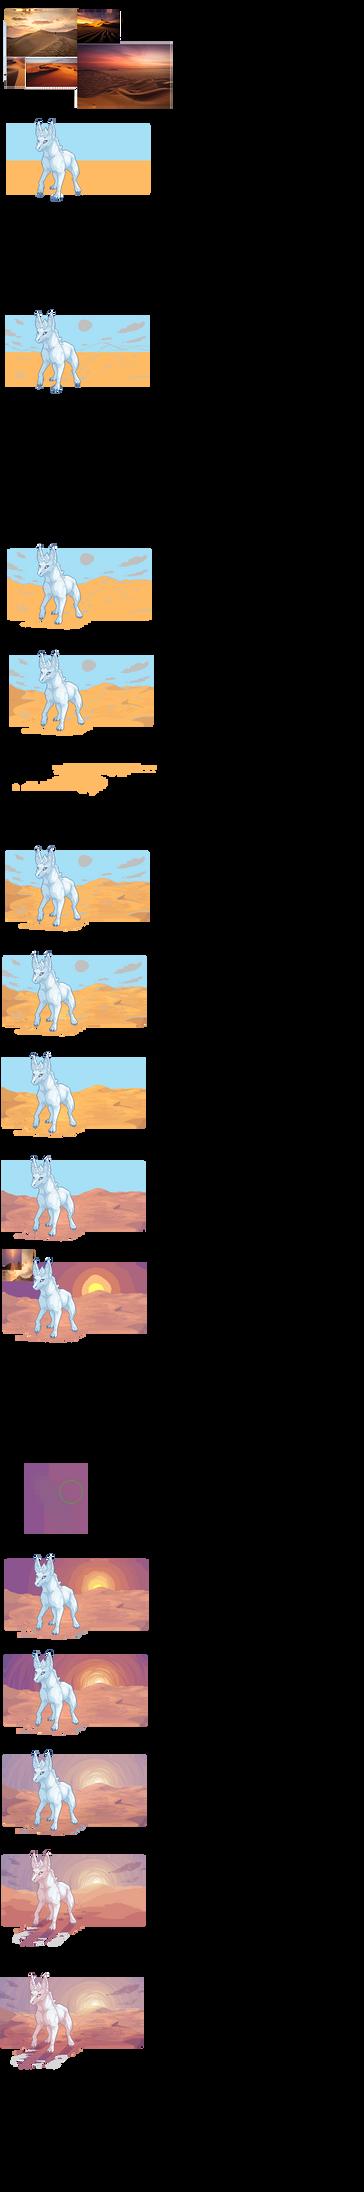 Pixel background tutorial by DidTheSqd